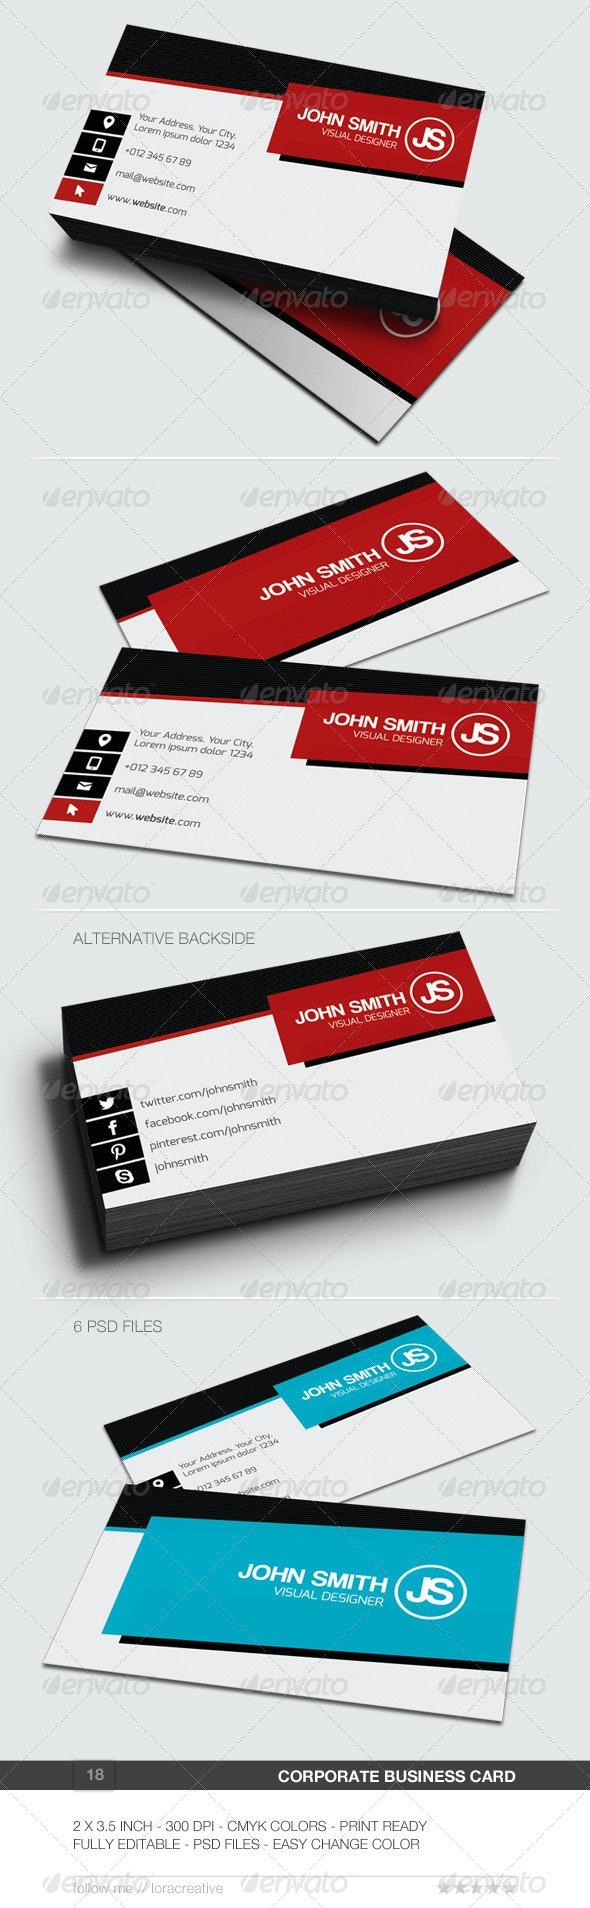 Corporate Business Card - 18 - Corporate Business Cards